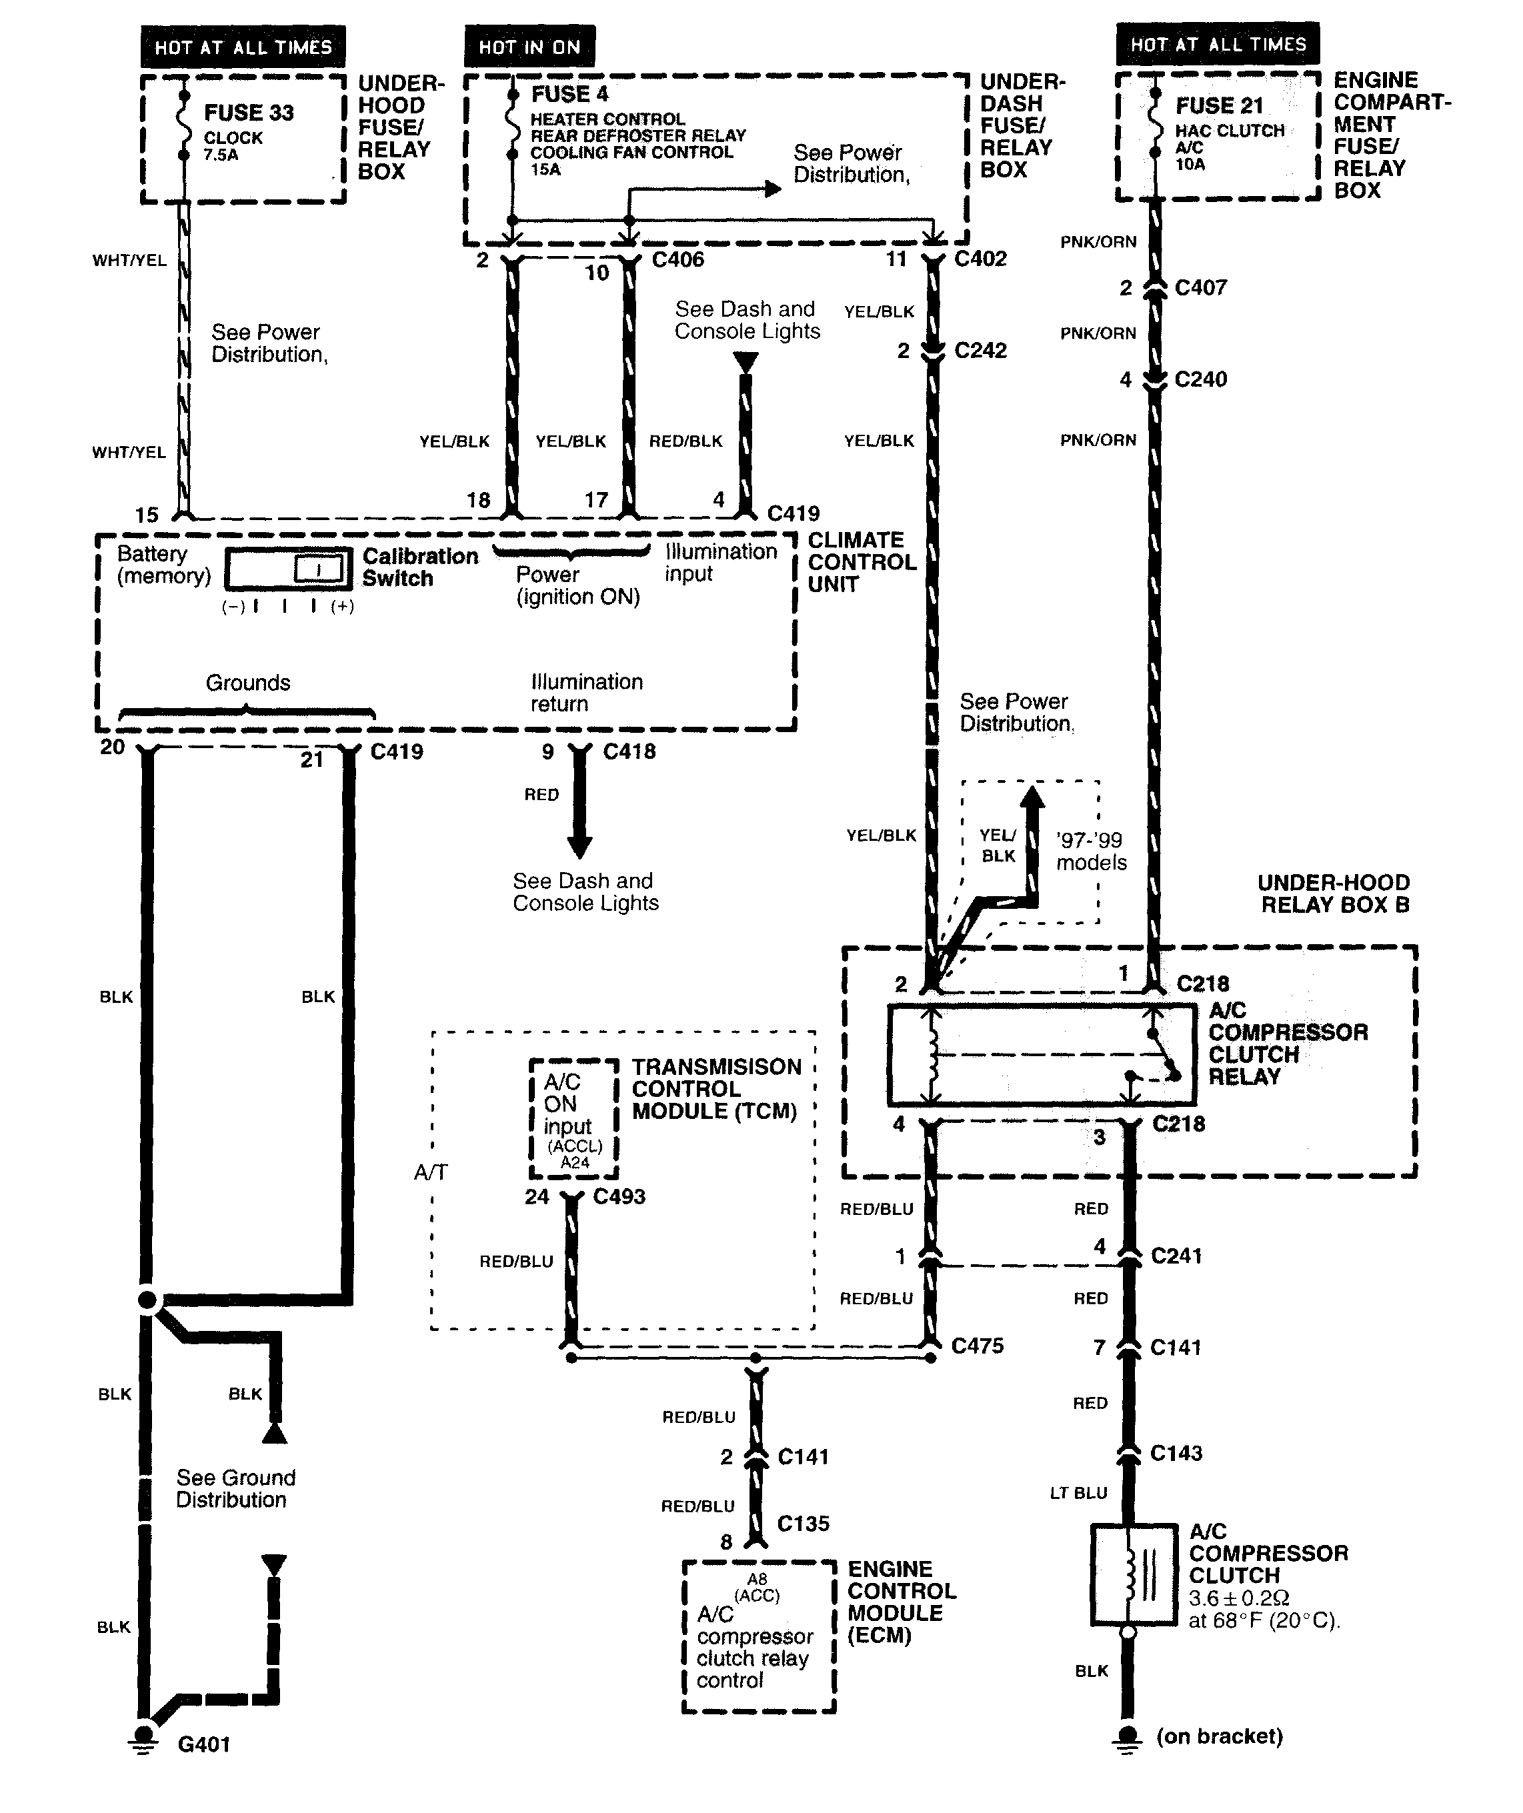 Acura NSX (1997 - 2004) - wiring diagrams - HVAC Controls -  Carknowledge.info | Acura Nsx Wiring Diagram |  | Carknowledge.info